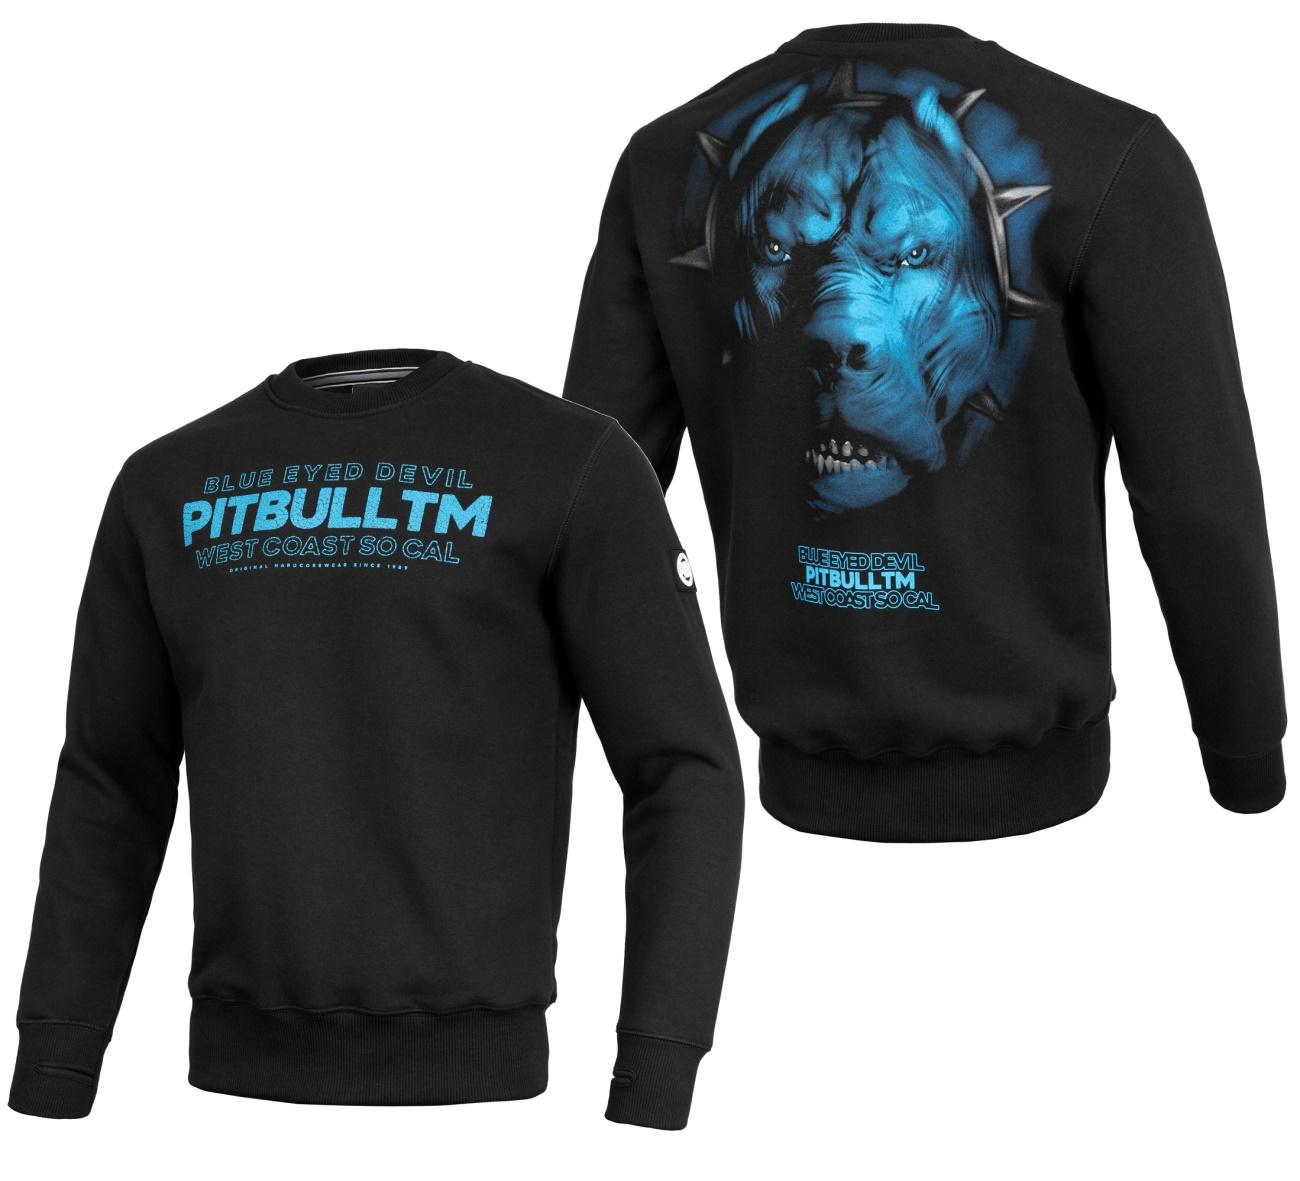 Pit Bull West Coast Sweatshirt Blue Eyed Devil V